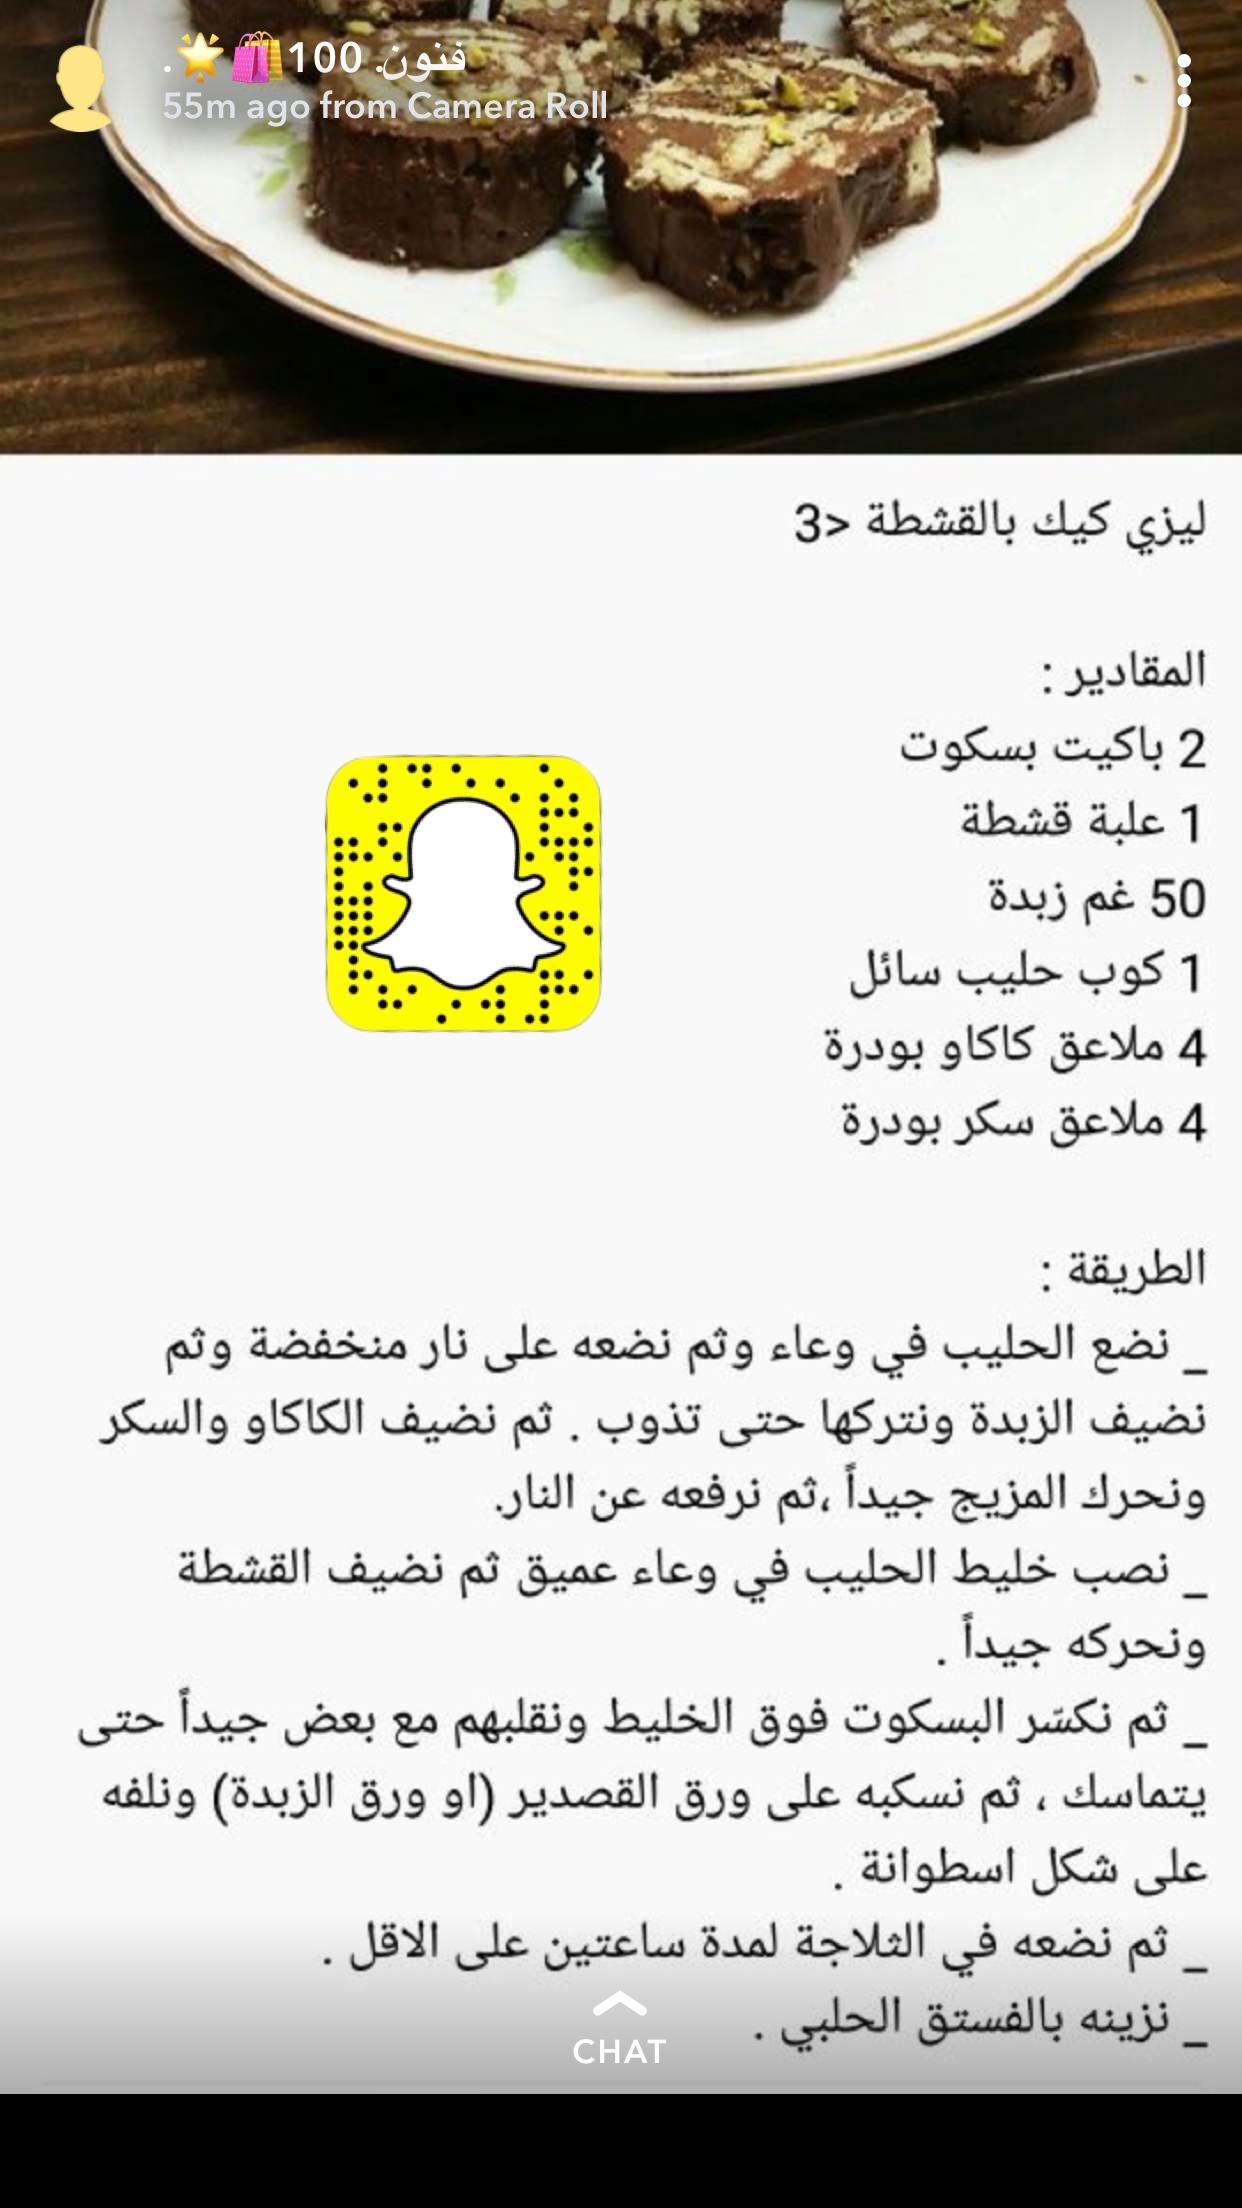 ليزي كيك Arabic Sweets Recipes Food Recipies Recipes